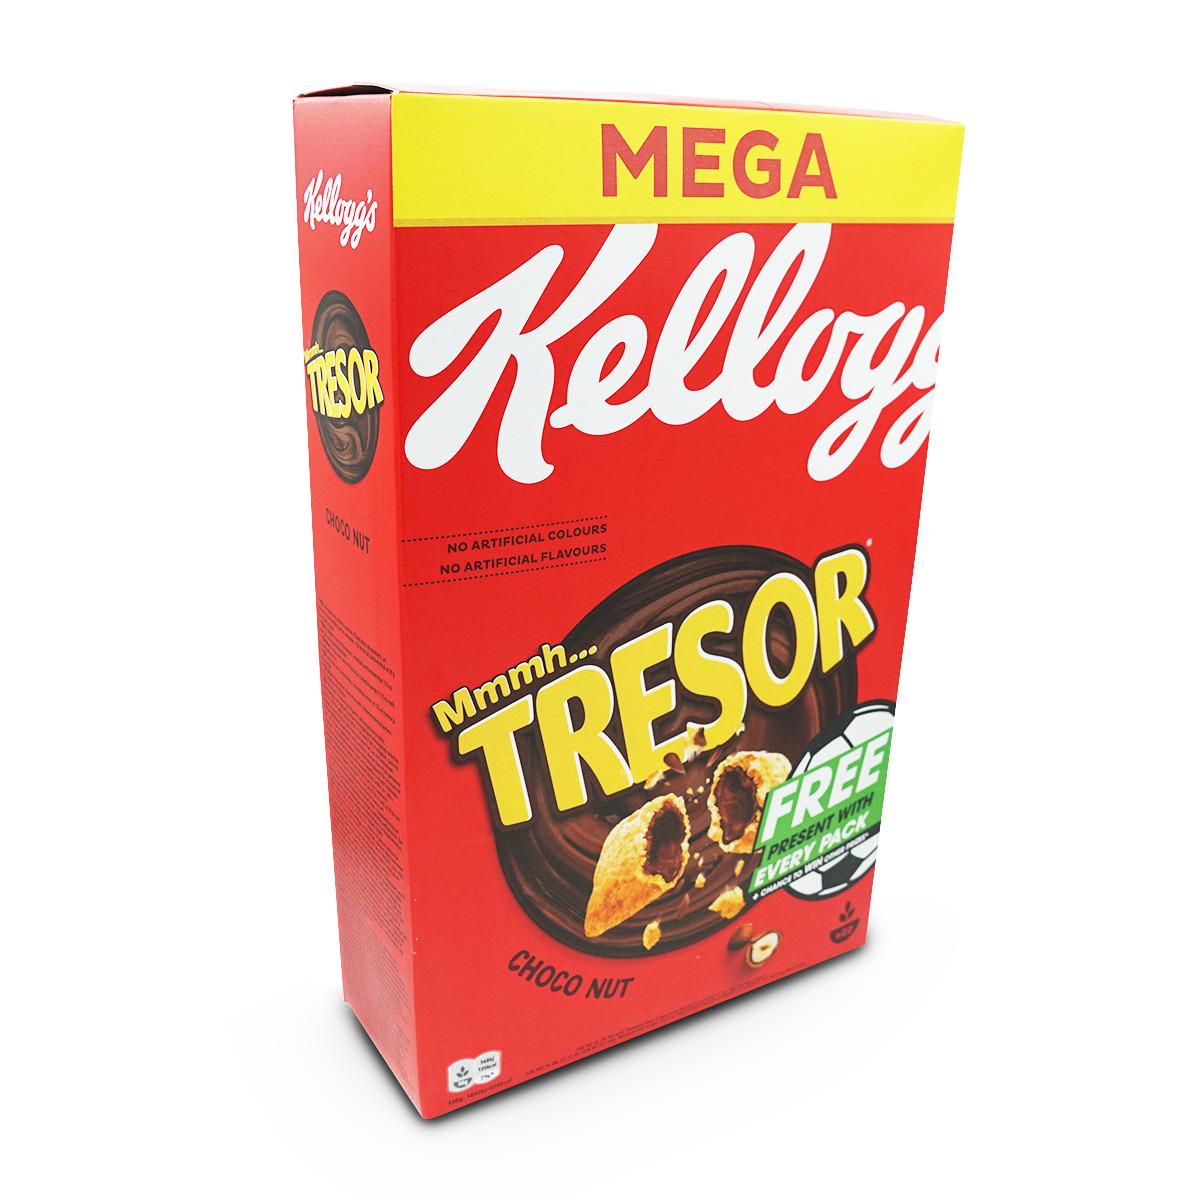 Kellogg's Tresor Choco